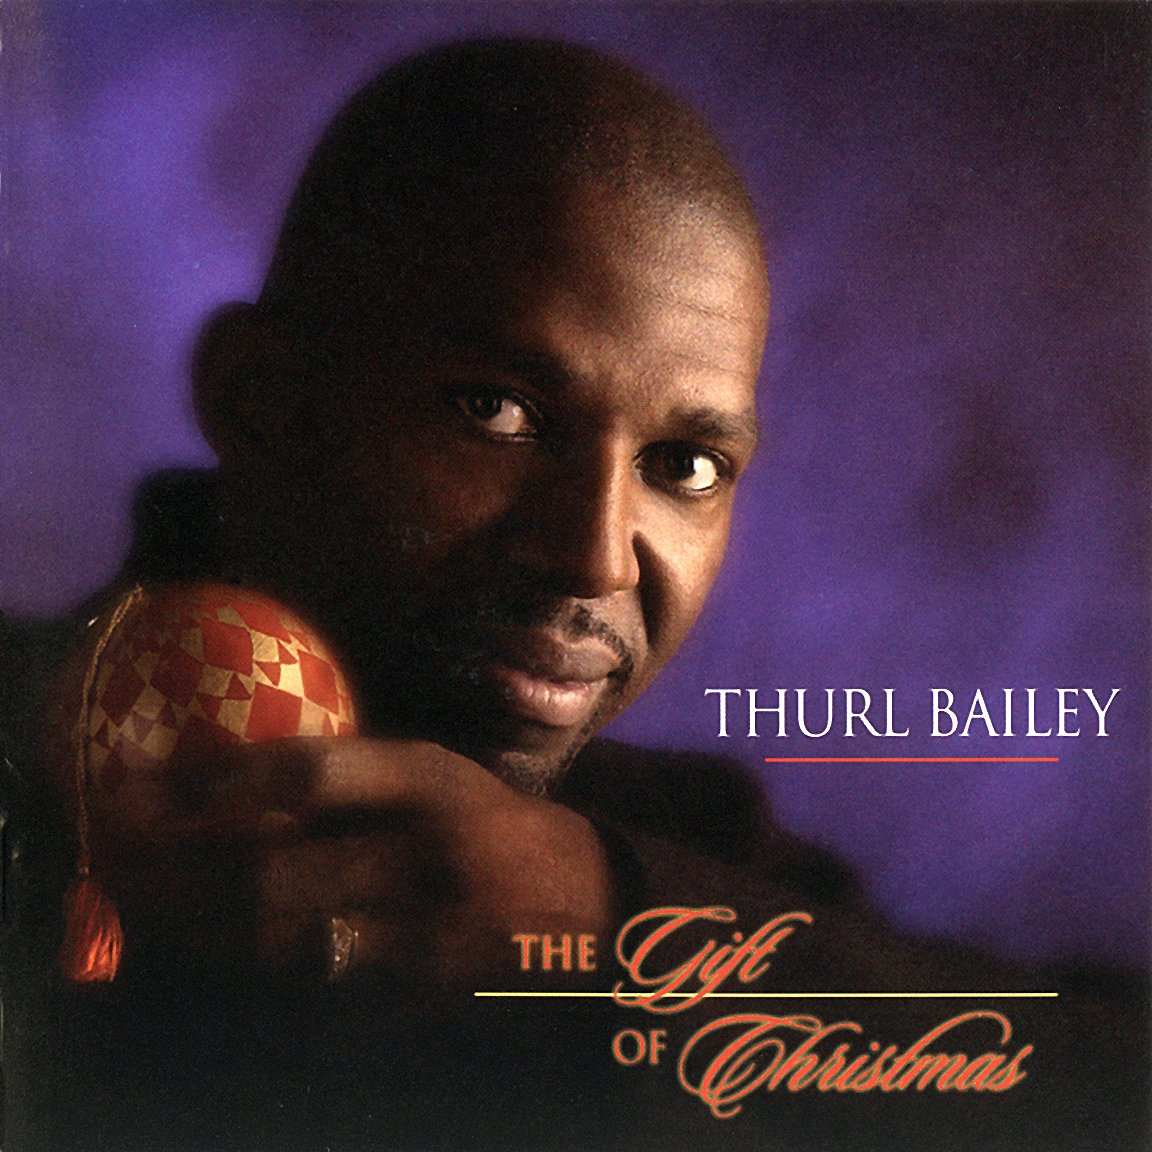 Thurl Bailey The Gift of Christmas Amazon Music